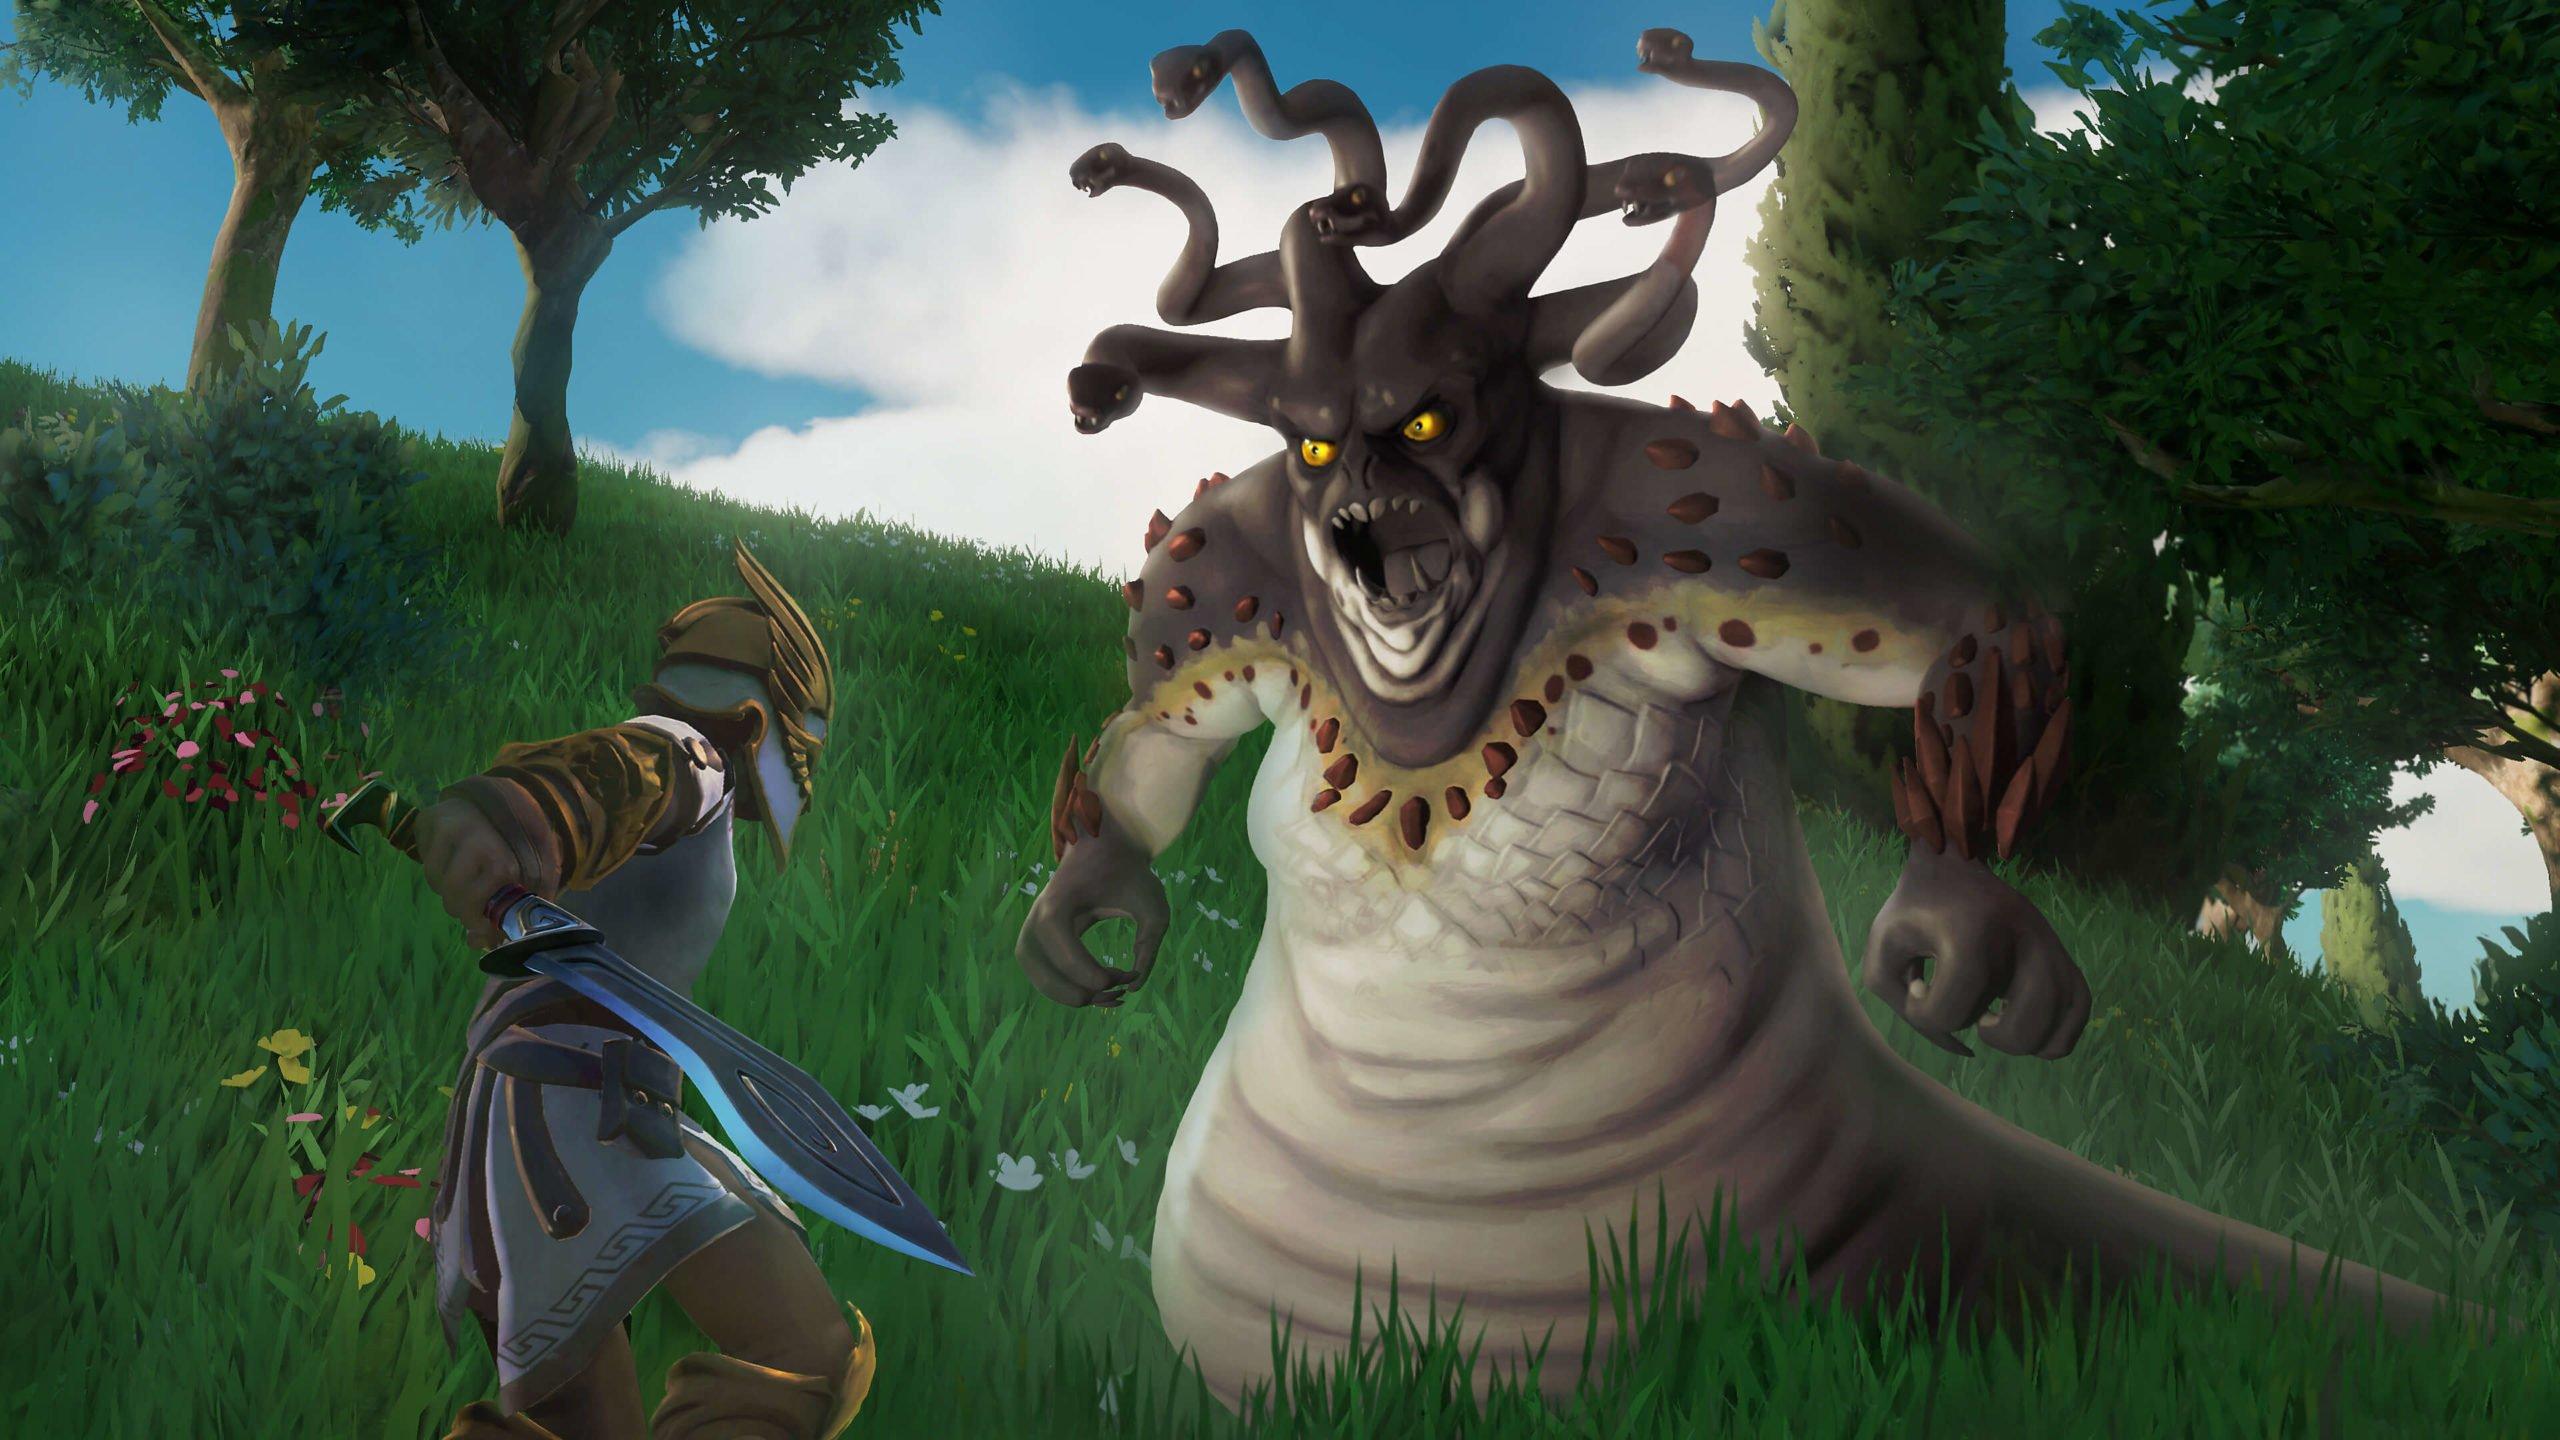 Immortals: Fenyx Rising (Gods & Monsters)